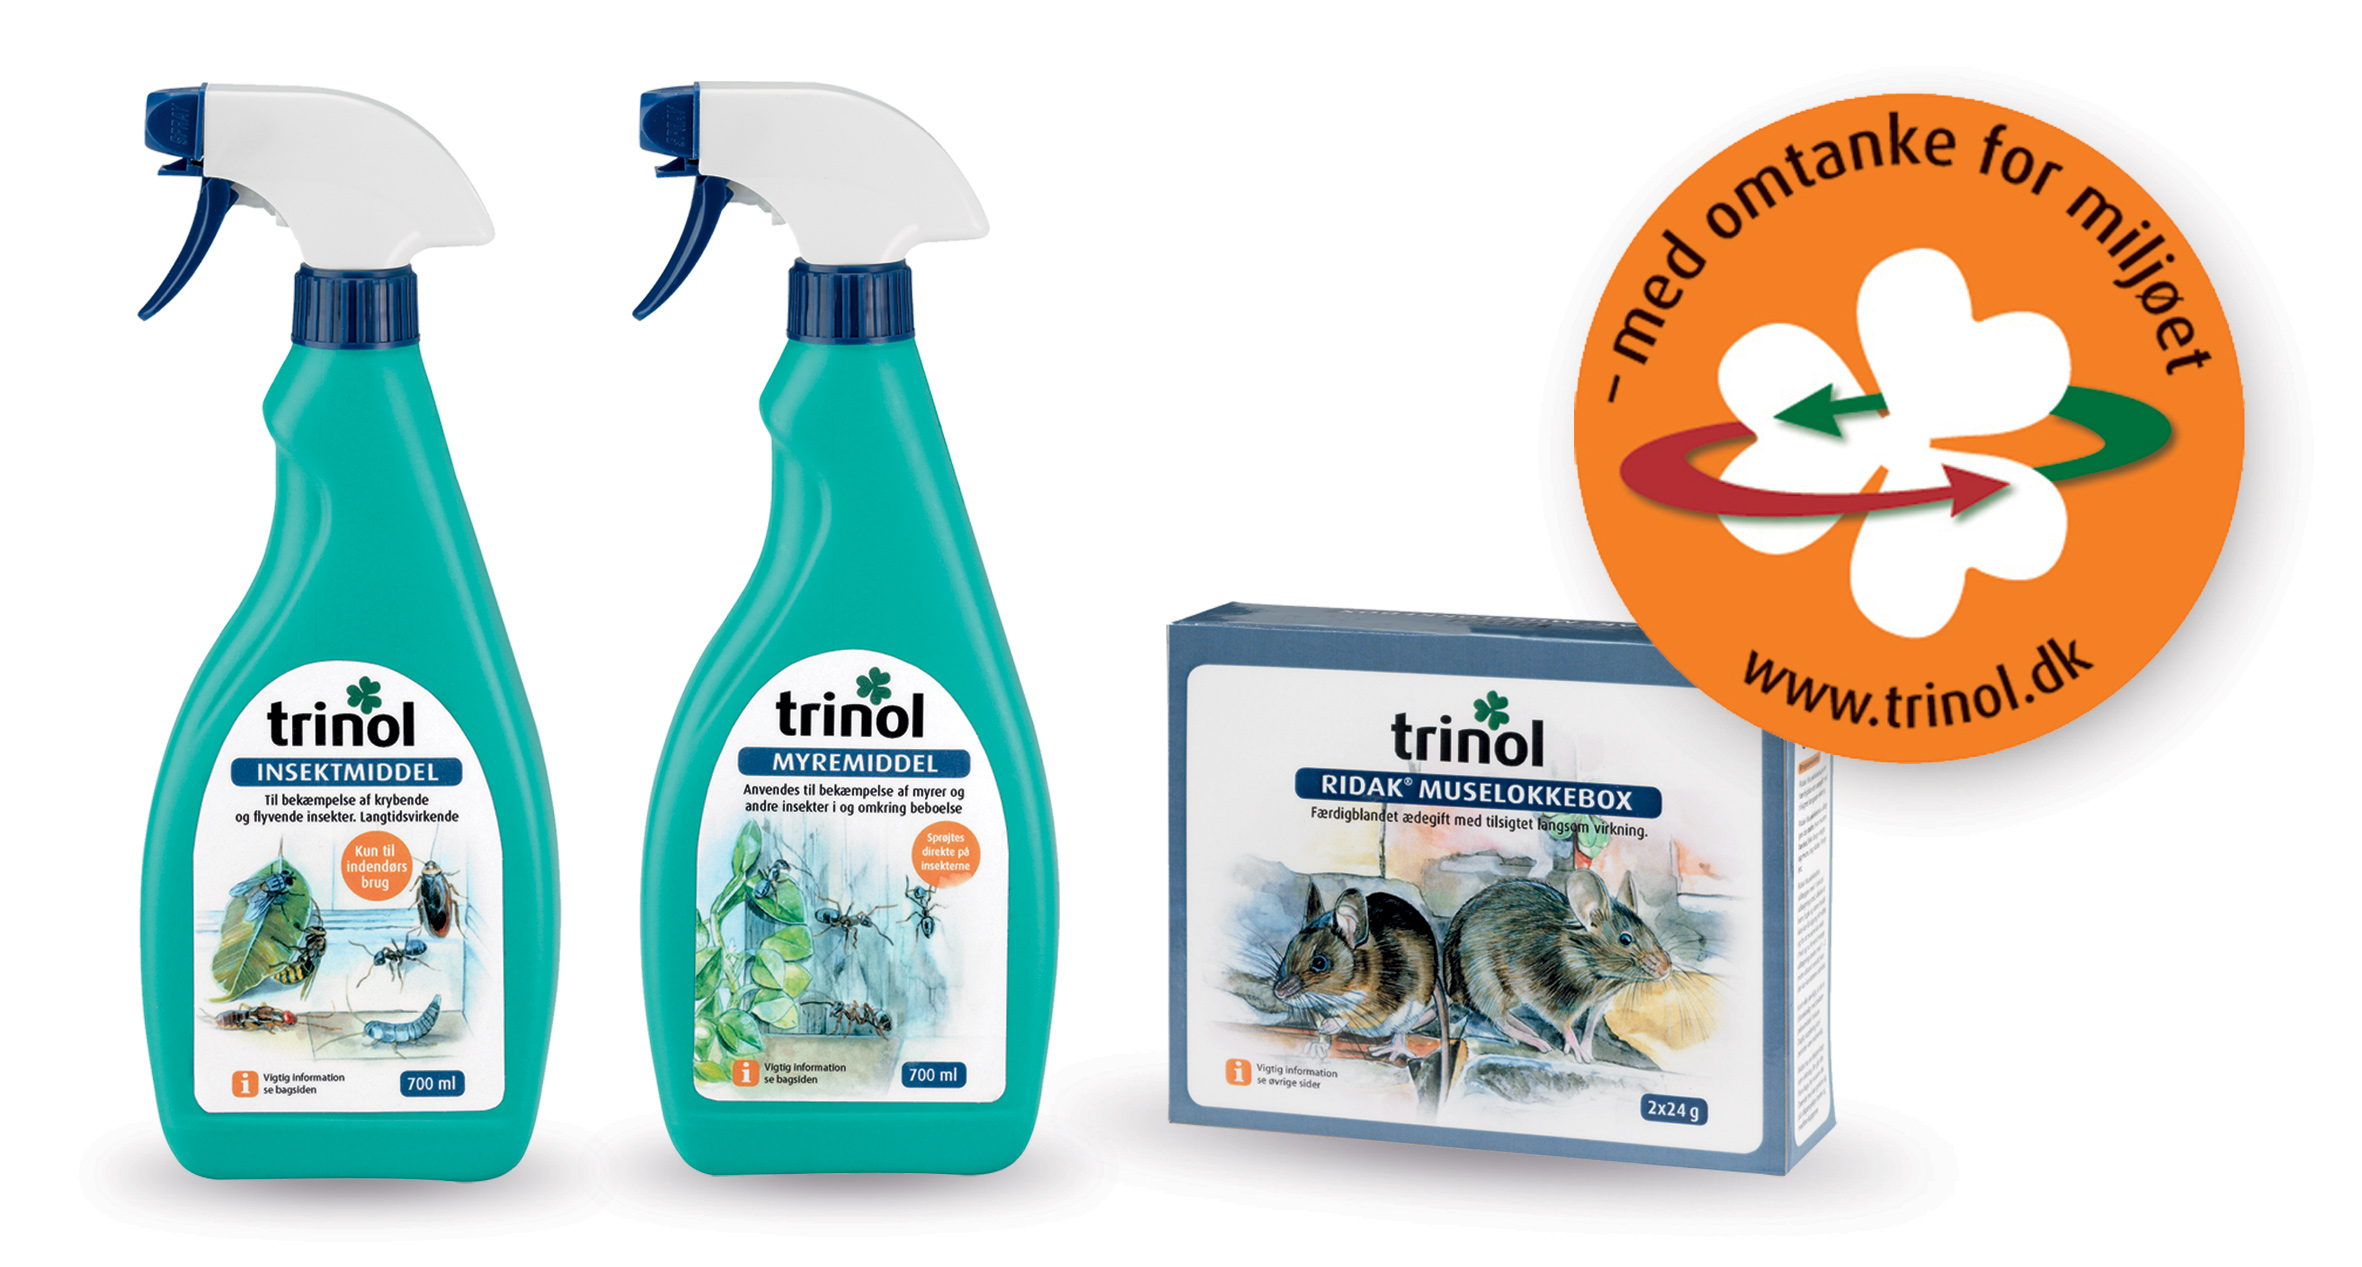 Trinol-emballager